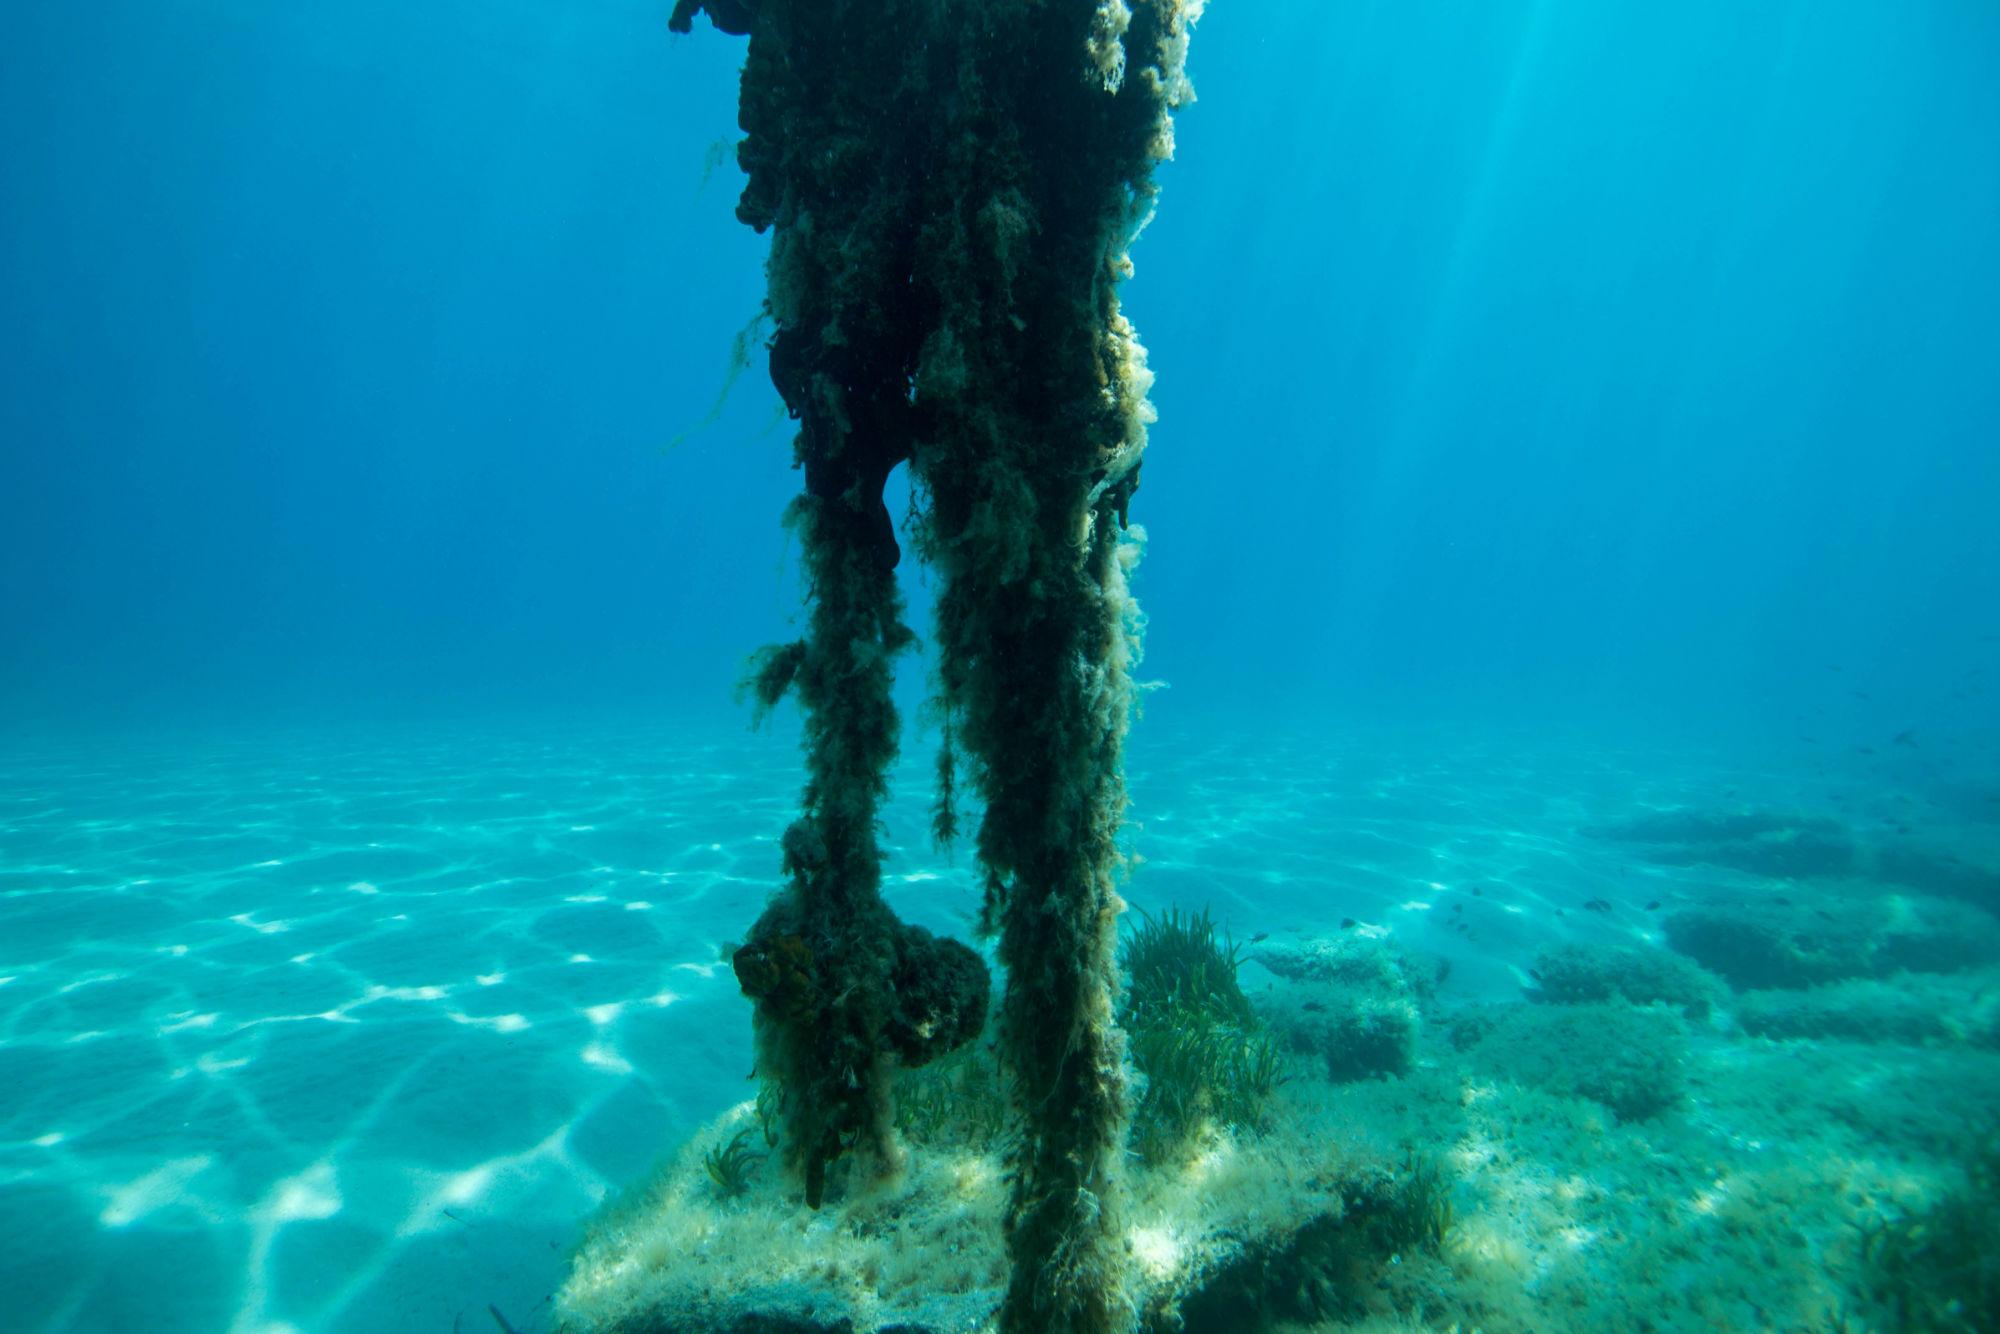 Tall Underwater Thing